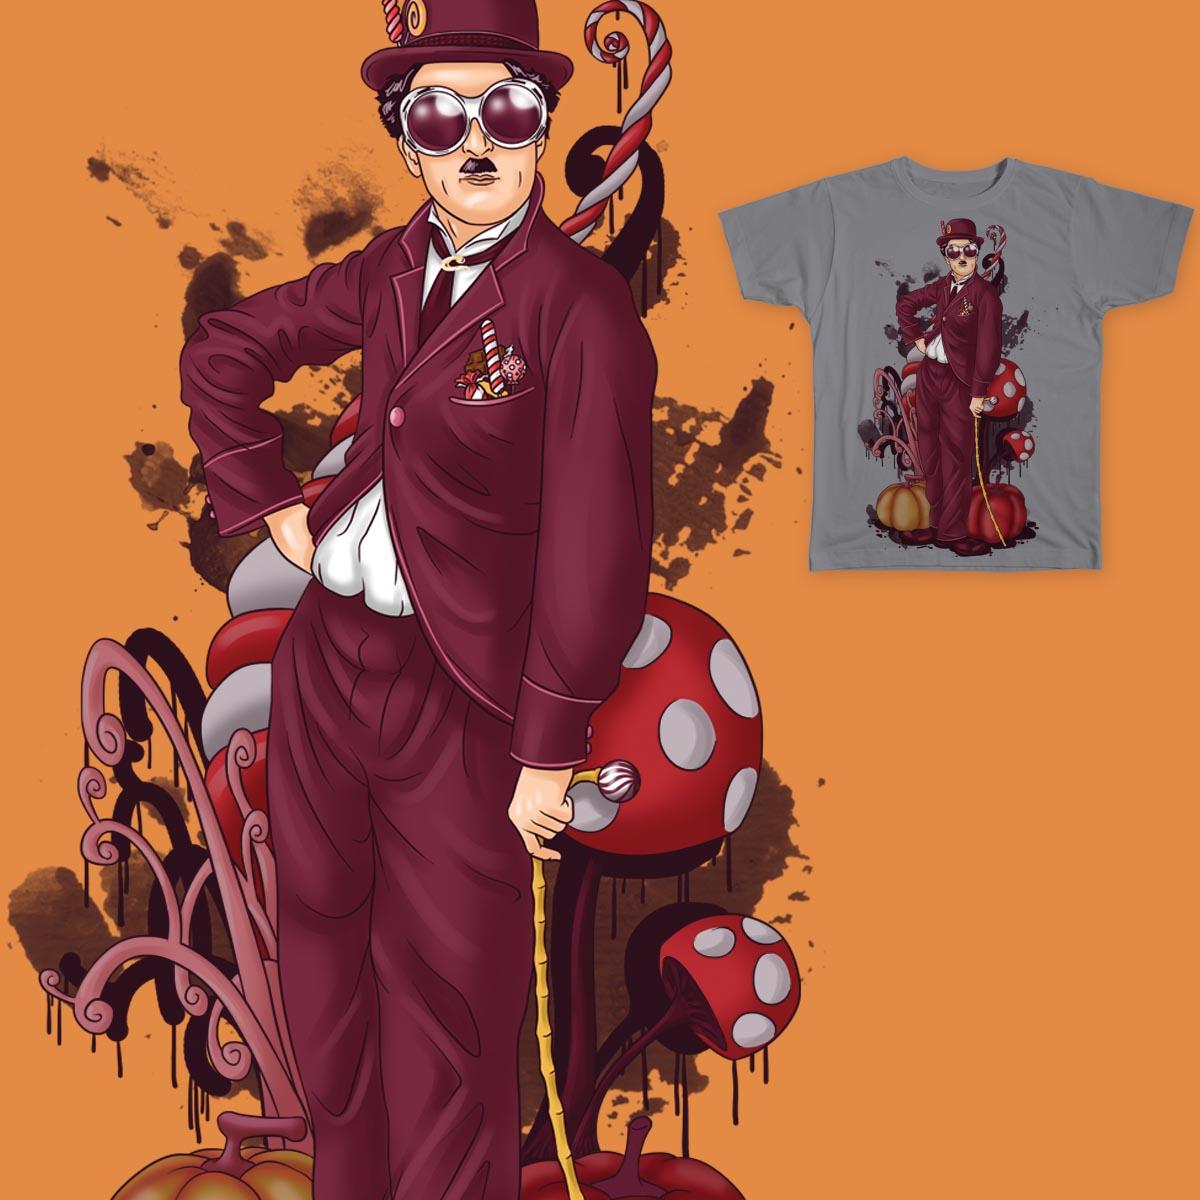 Charlie Chaplin at The Chocolate Factory by Akari Kokoh on Threadless